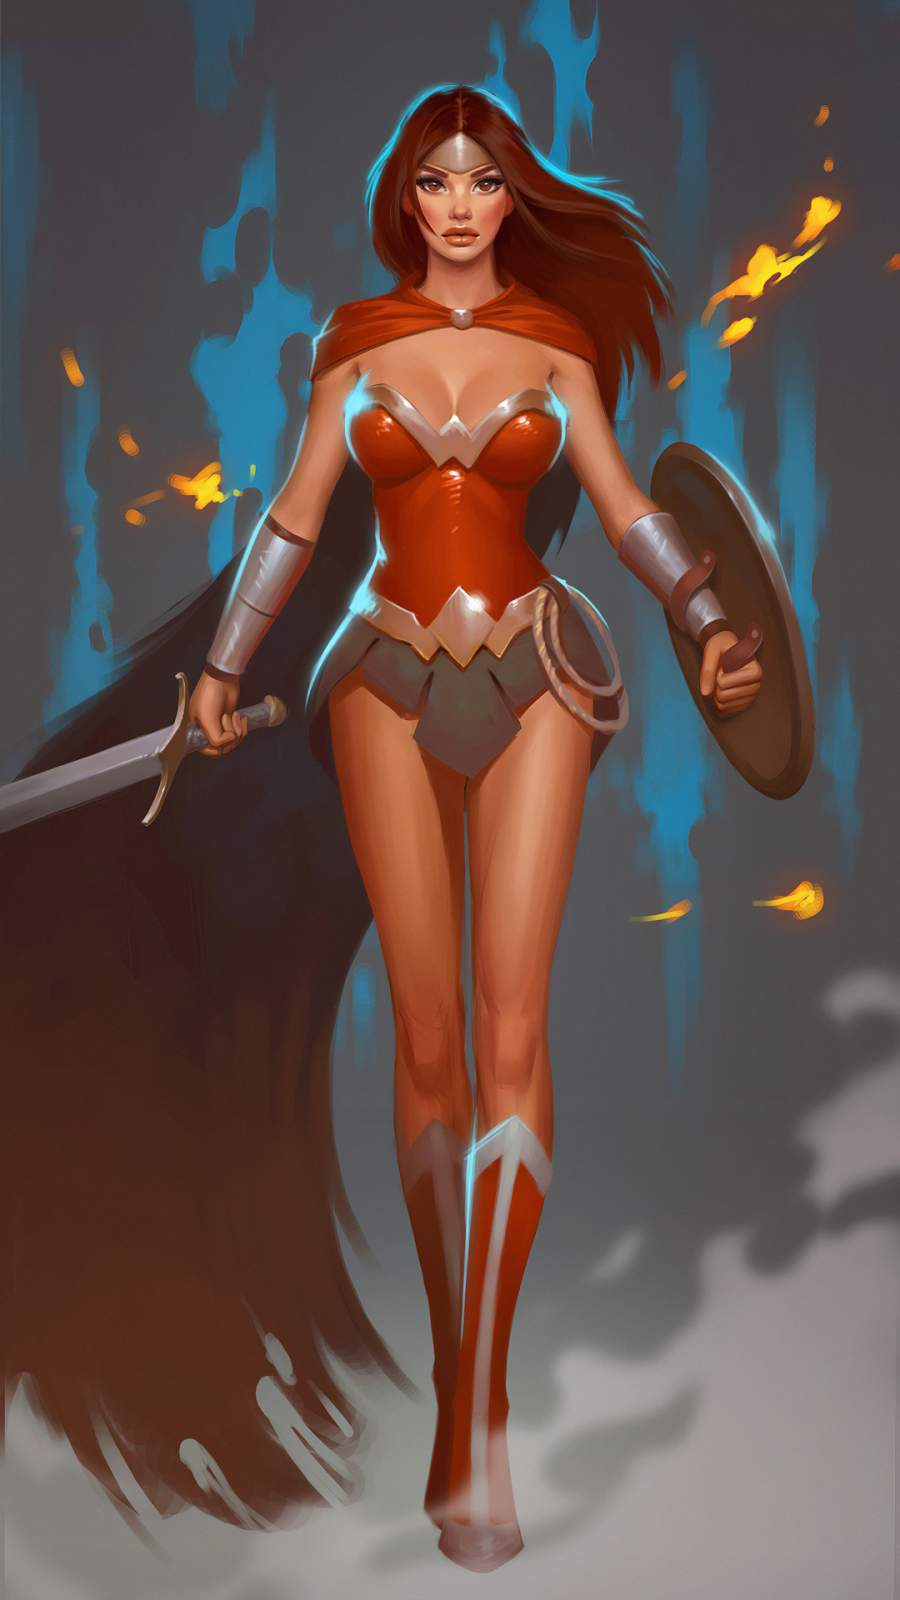 Wonder Woman Artistic iPhone Wallpaper